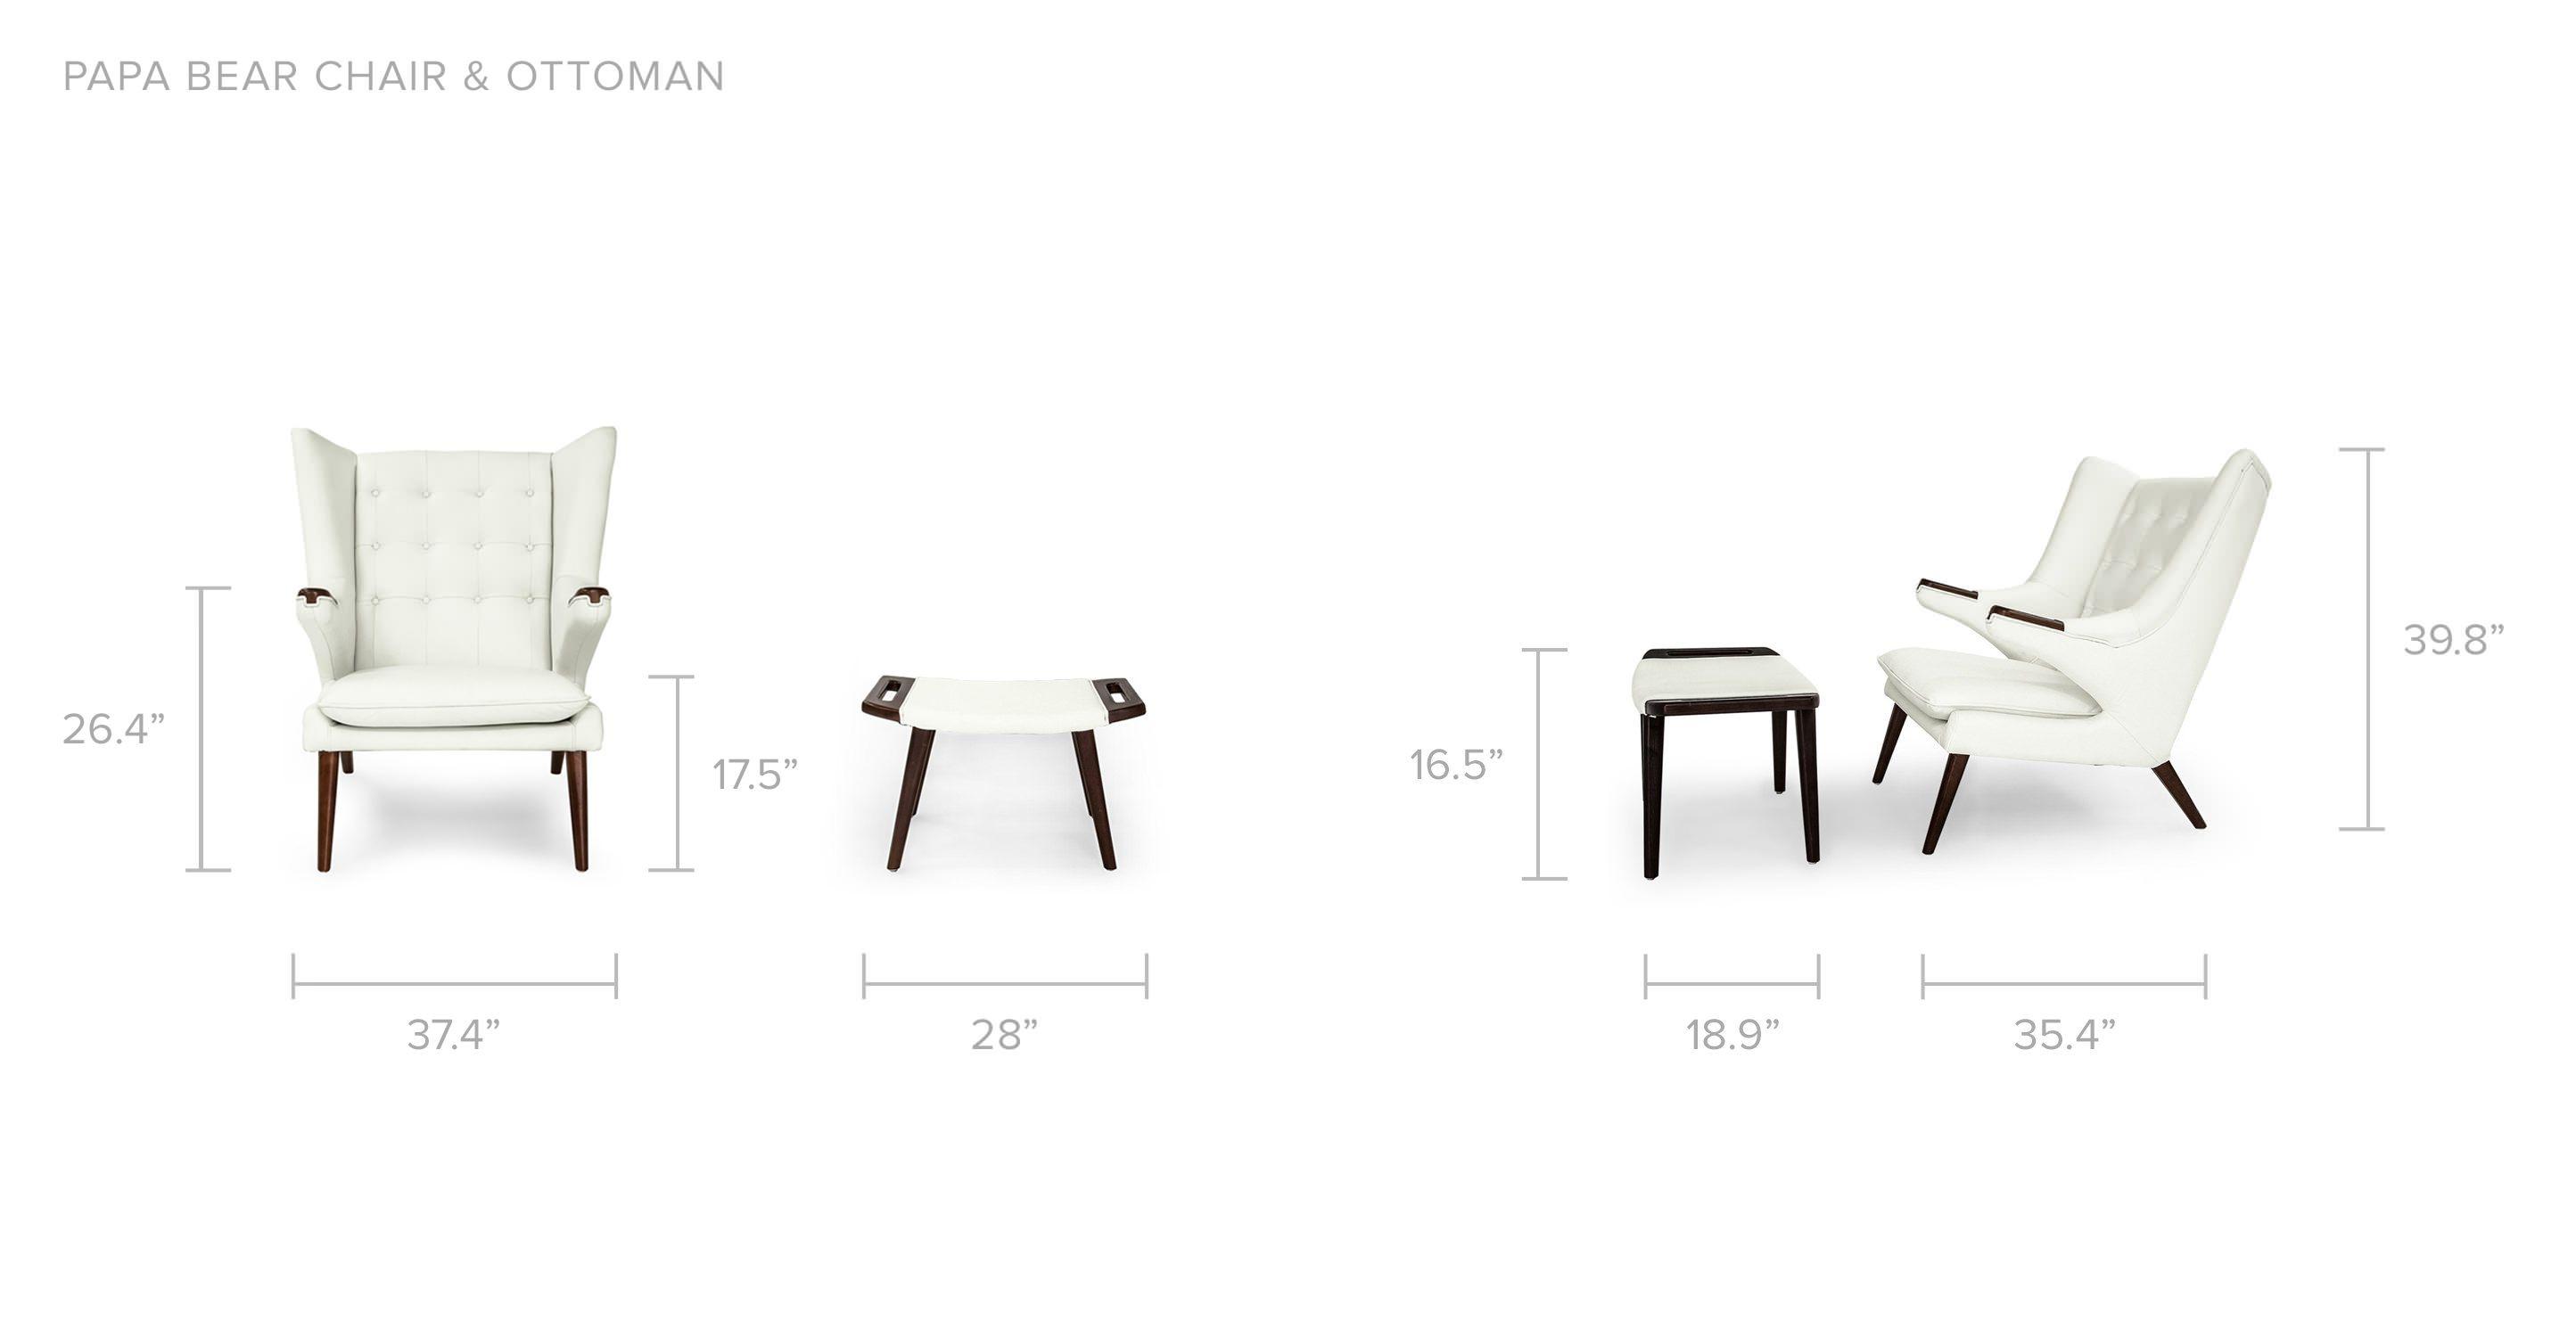 Papa Bear Chair & Ottoman Deco Moss Kar l